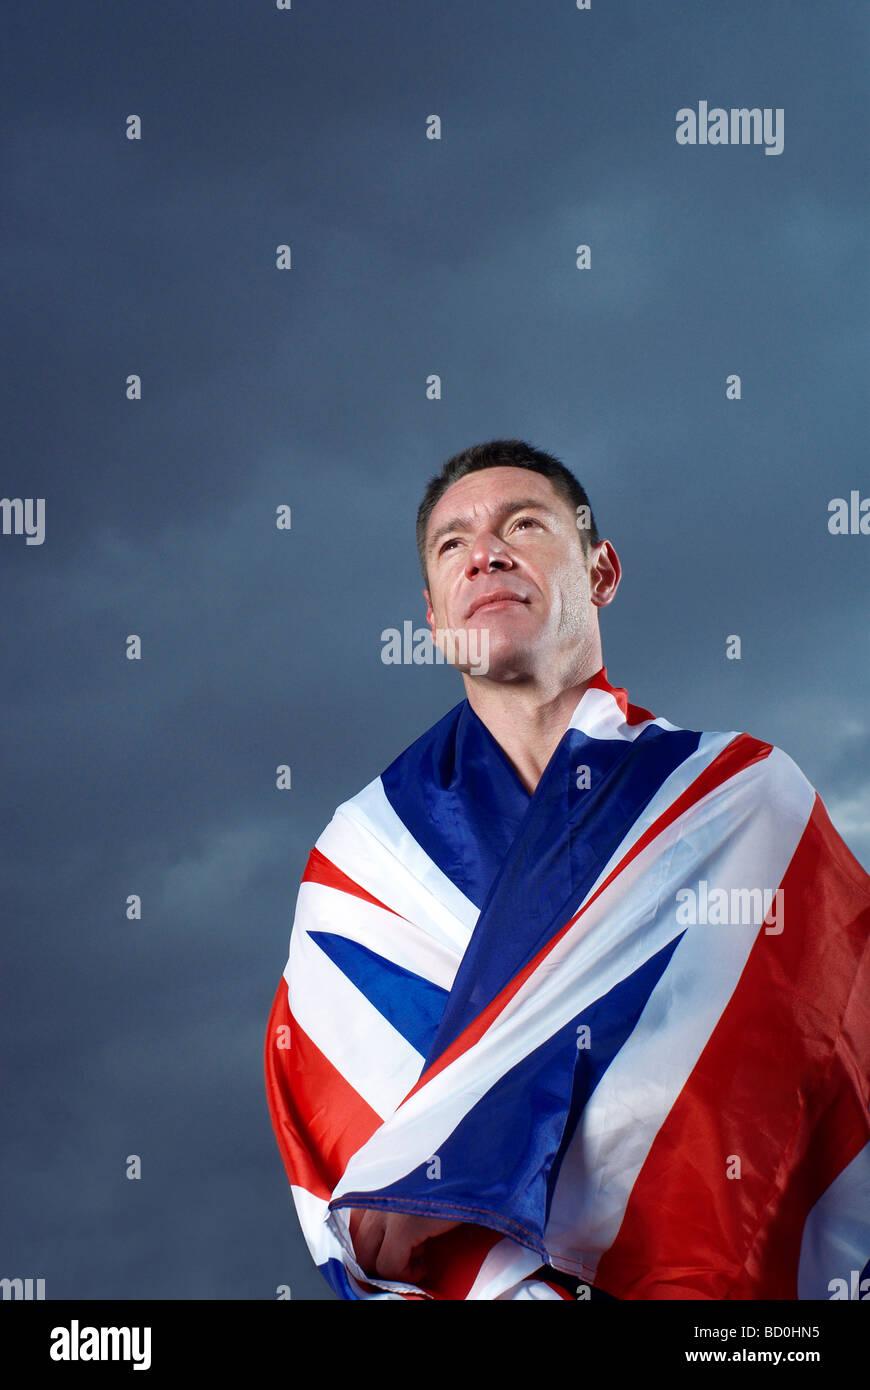 athlete wrapped in U.K. flag - Stock Image